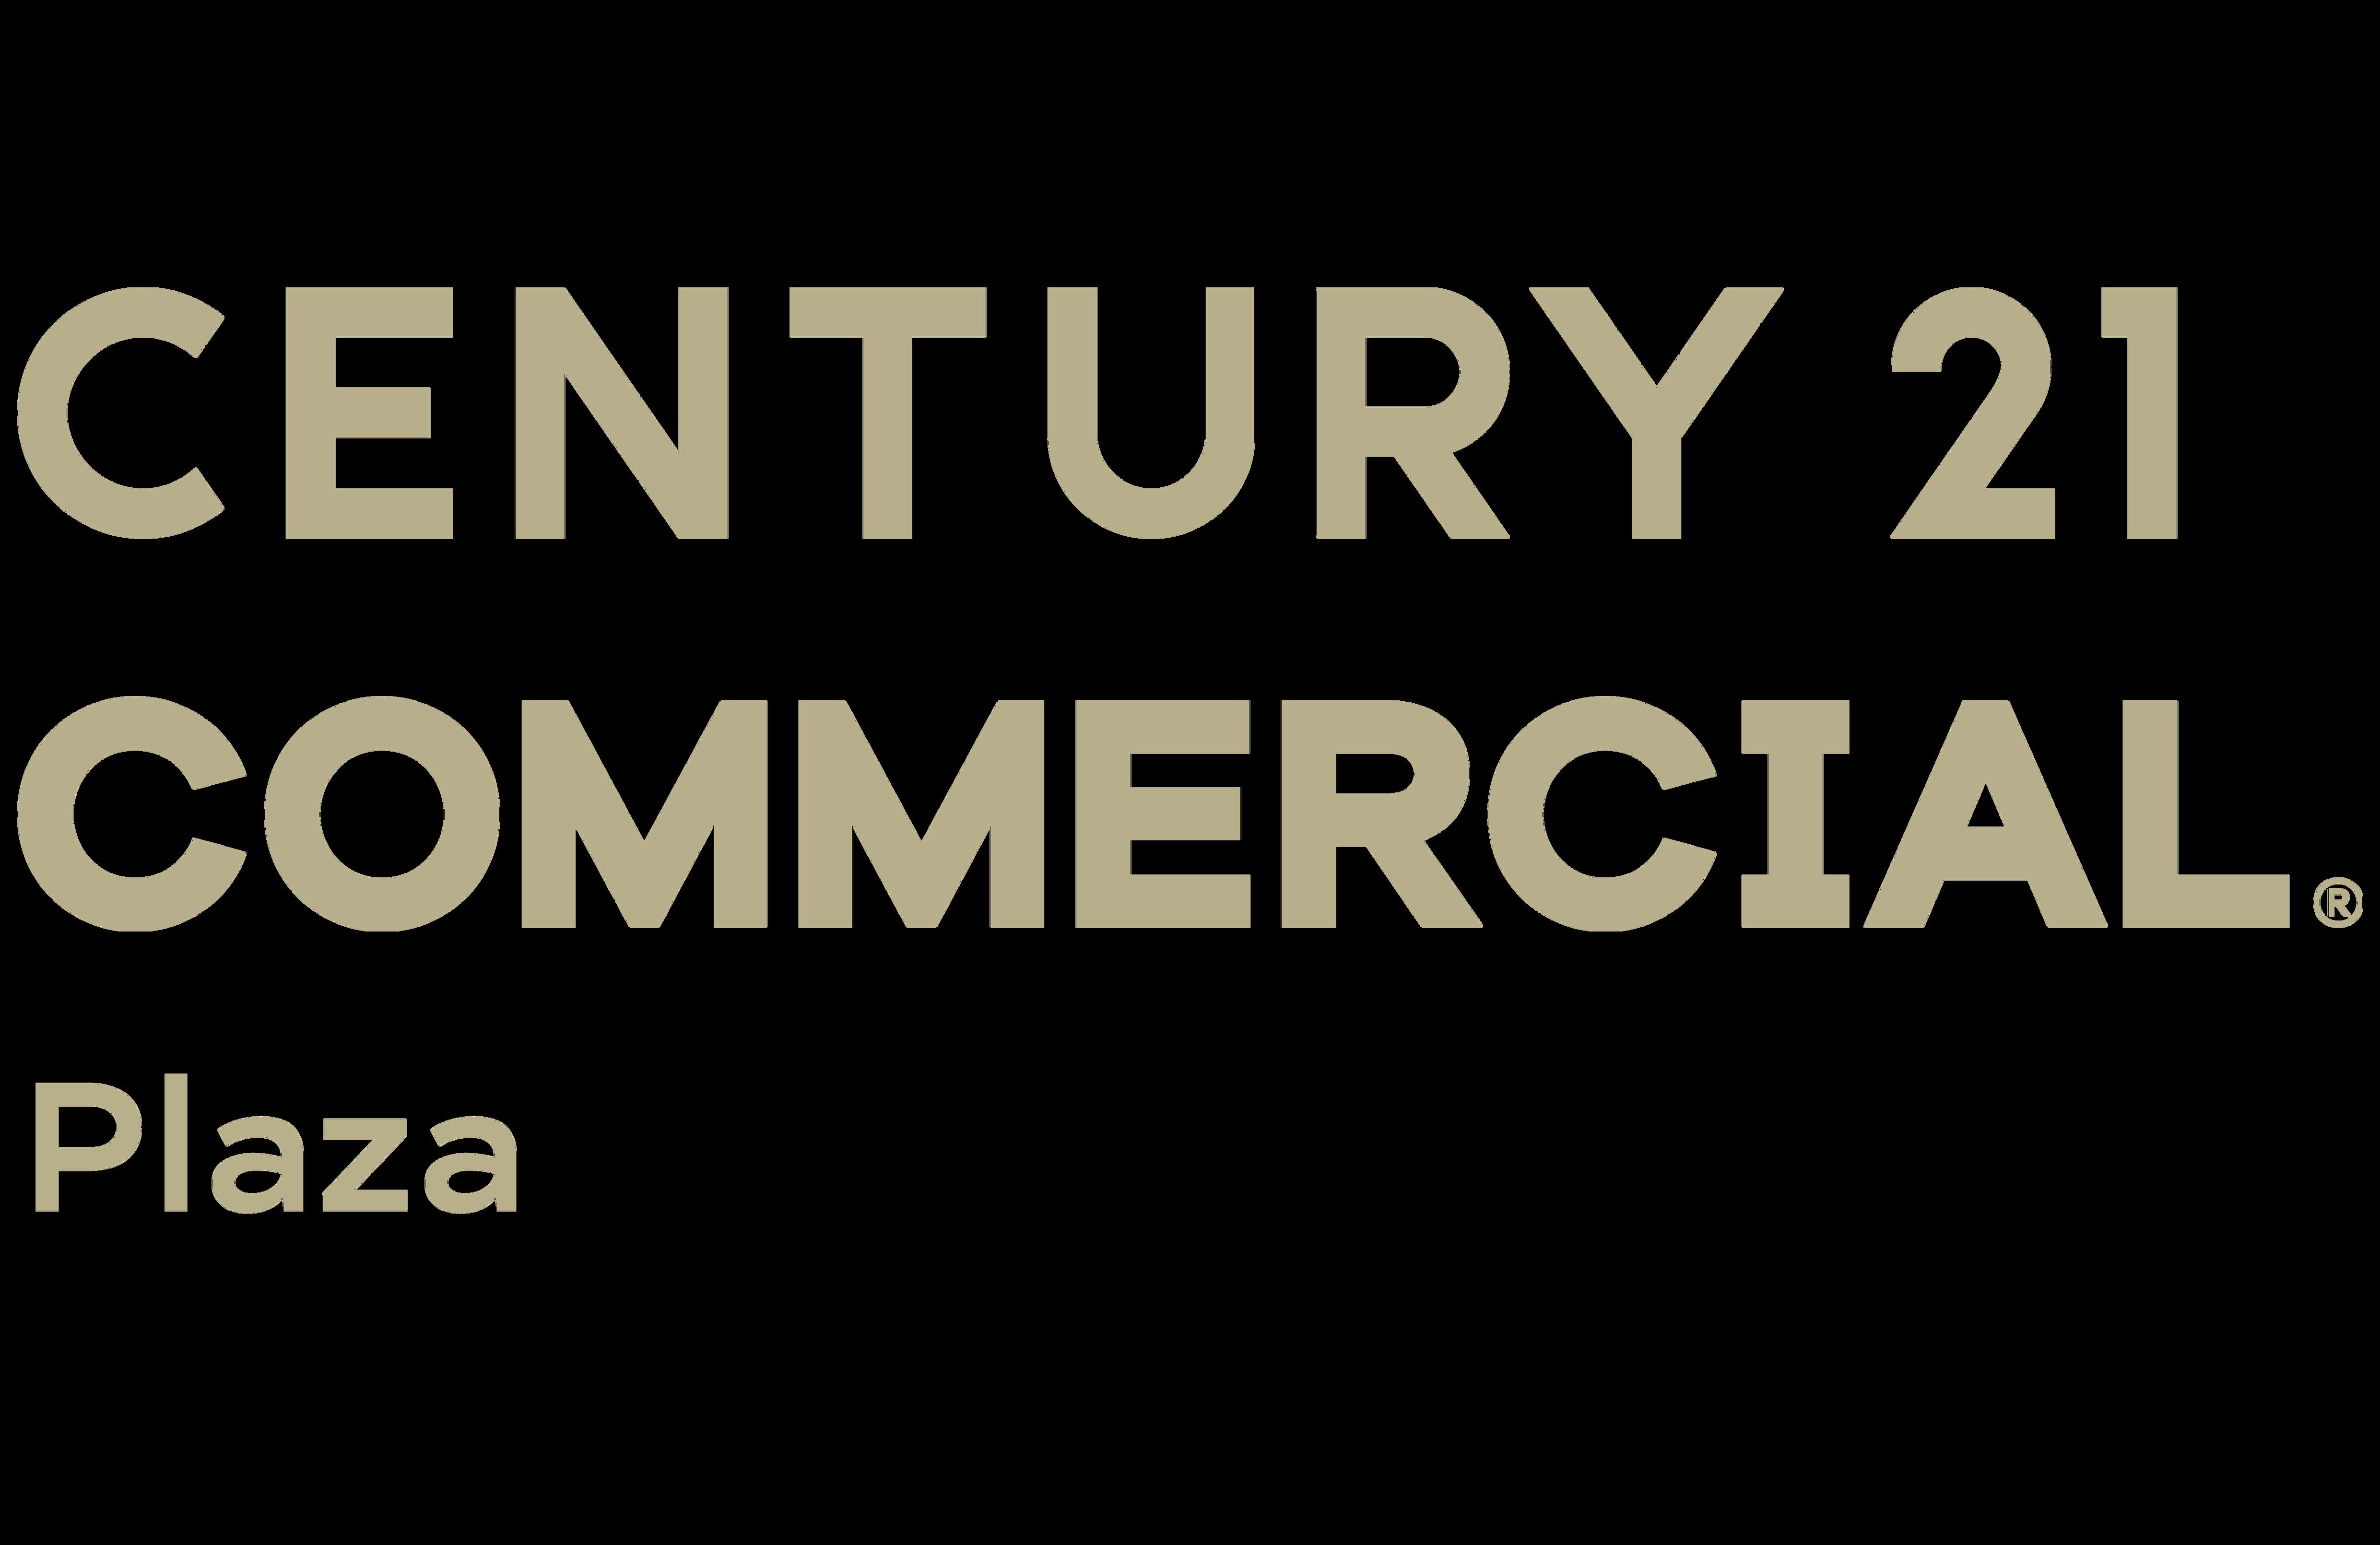 CENTURY 21 Plaza